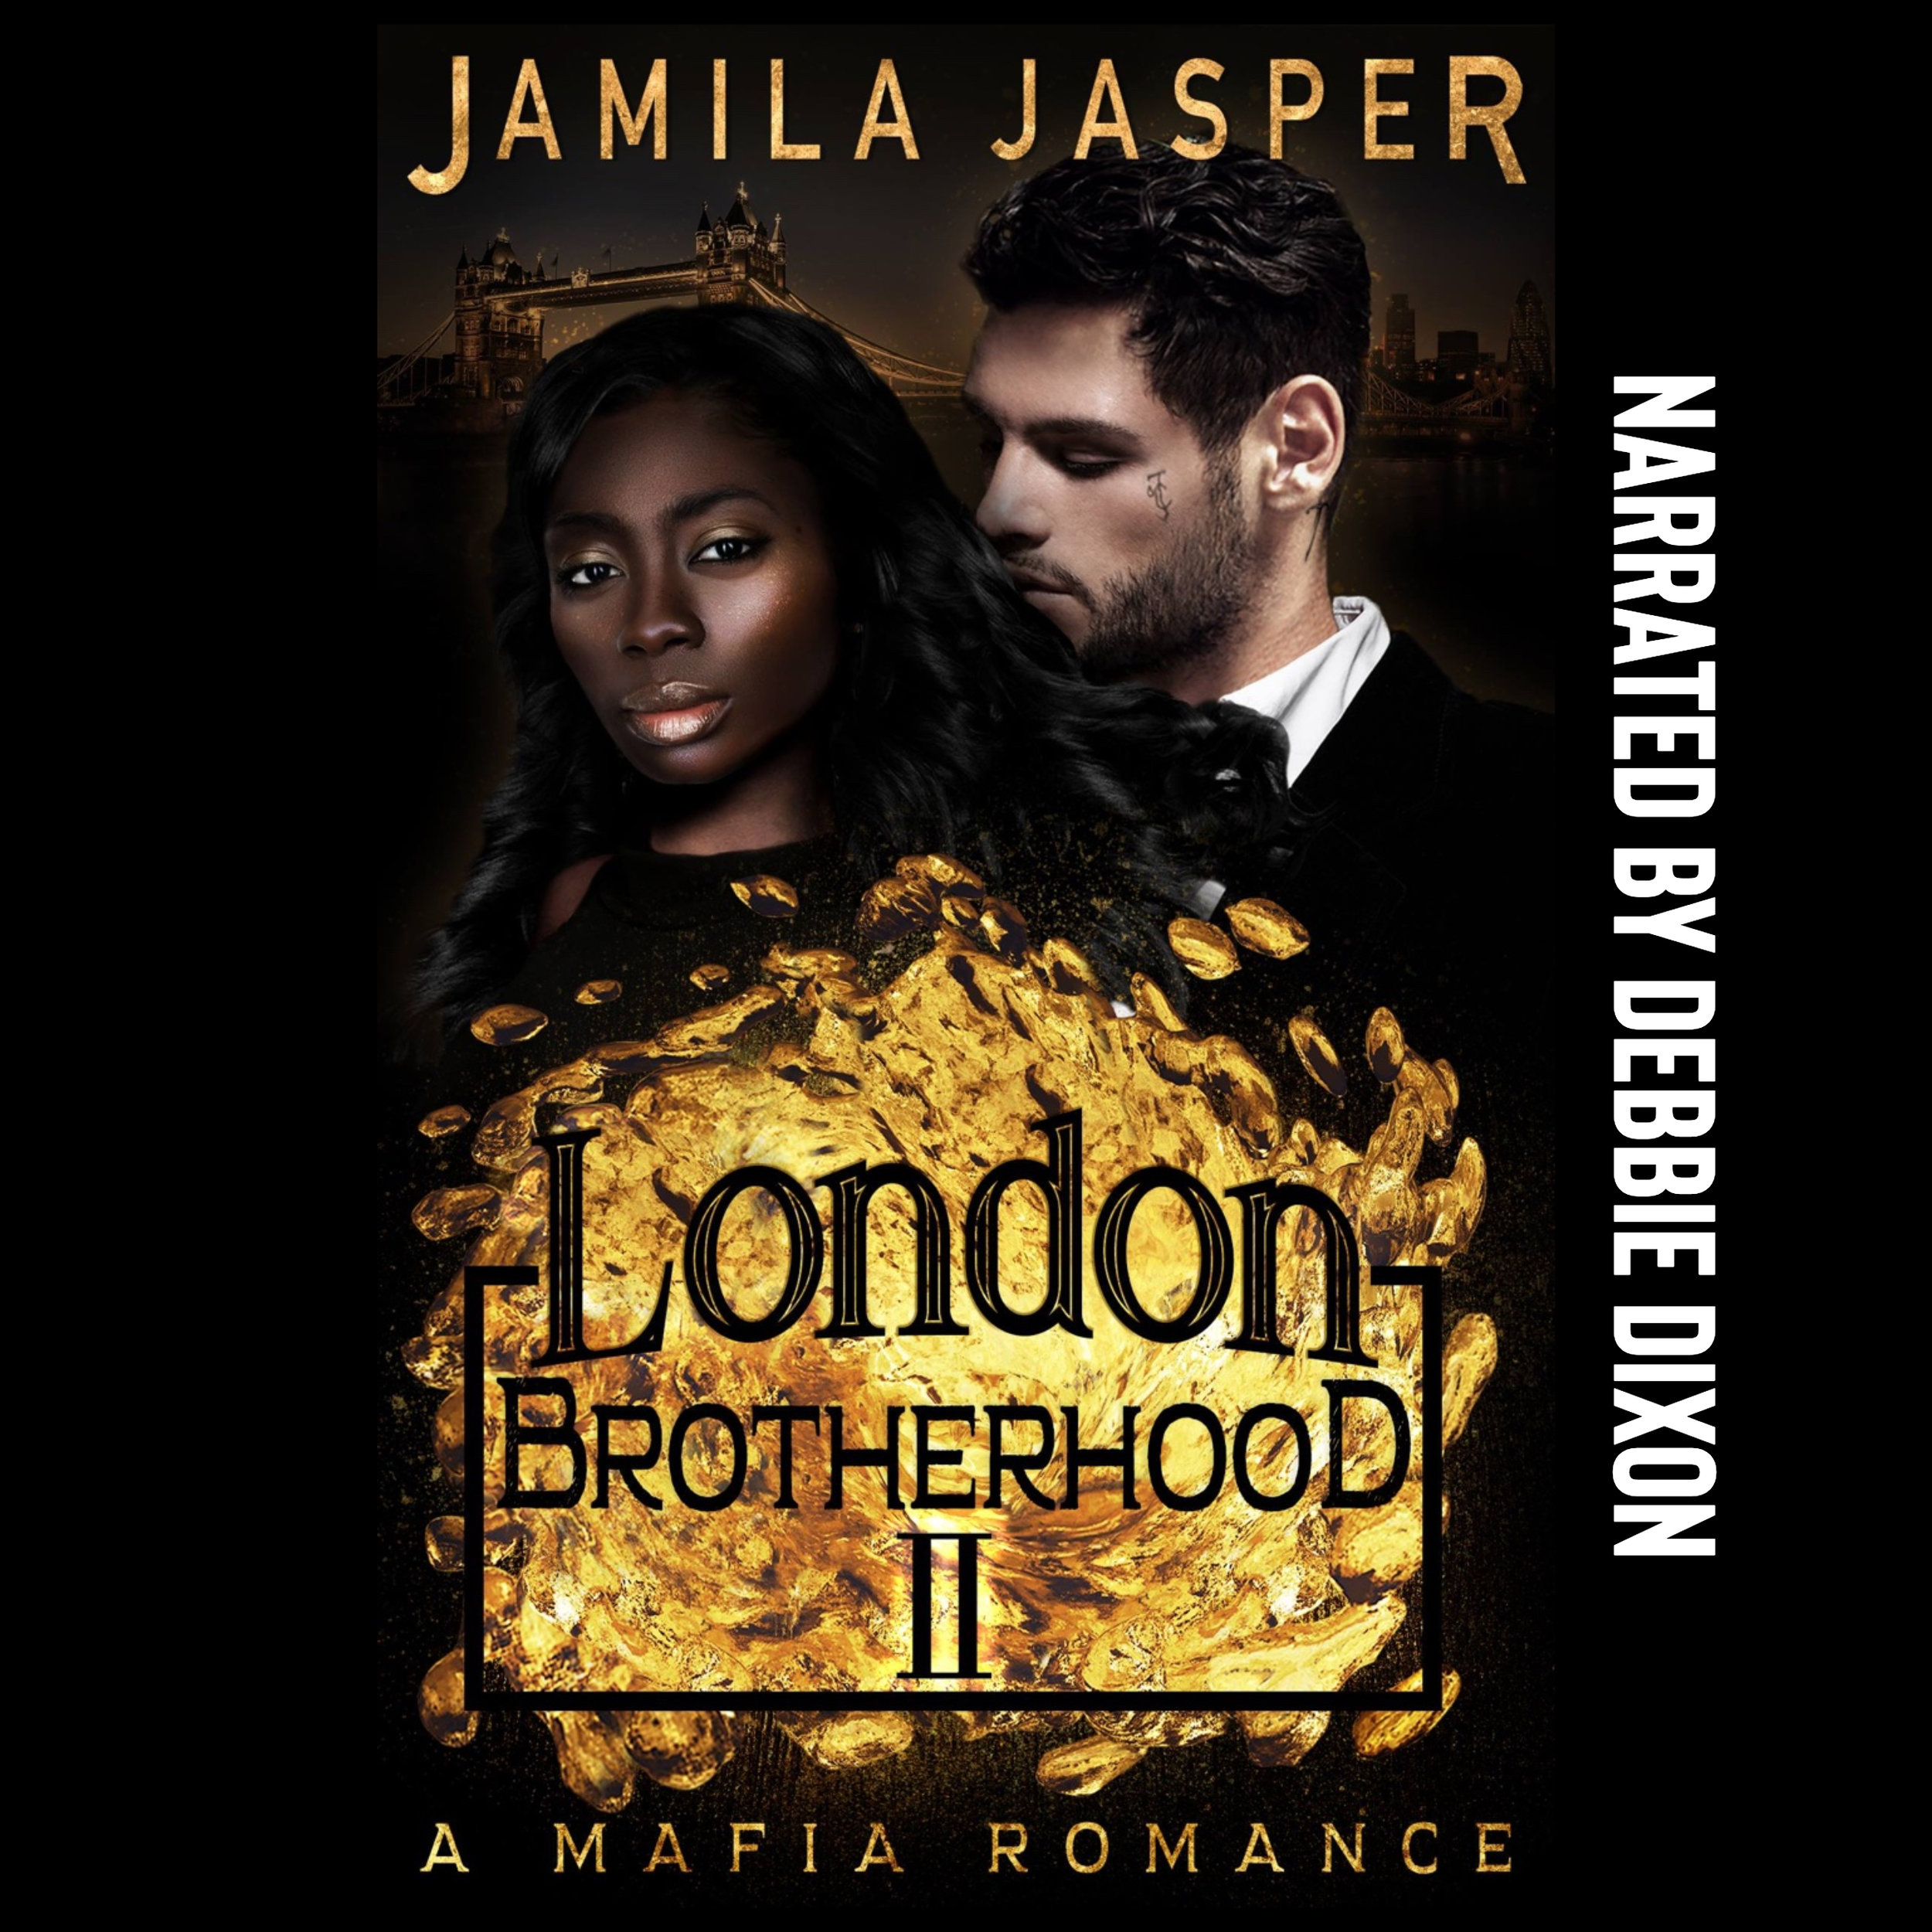 2 london brotherhood ii audiobook cover.jpg